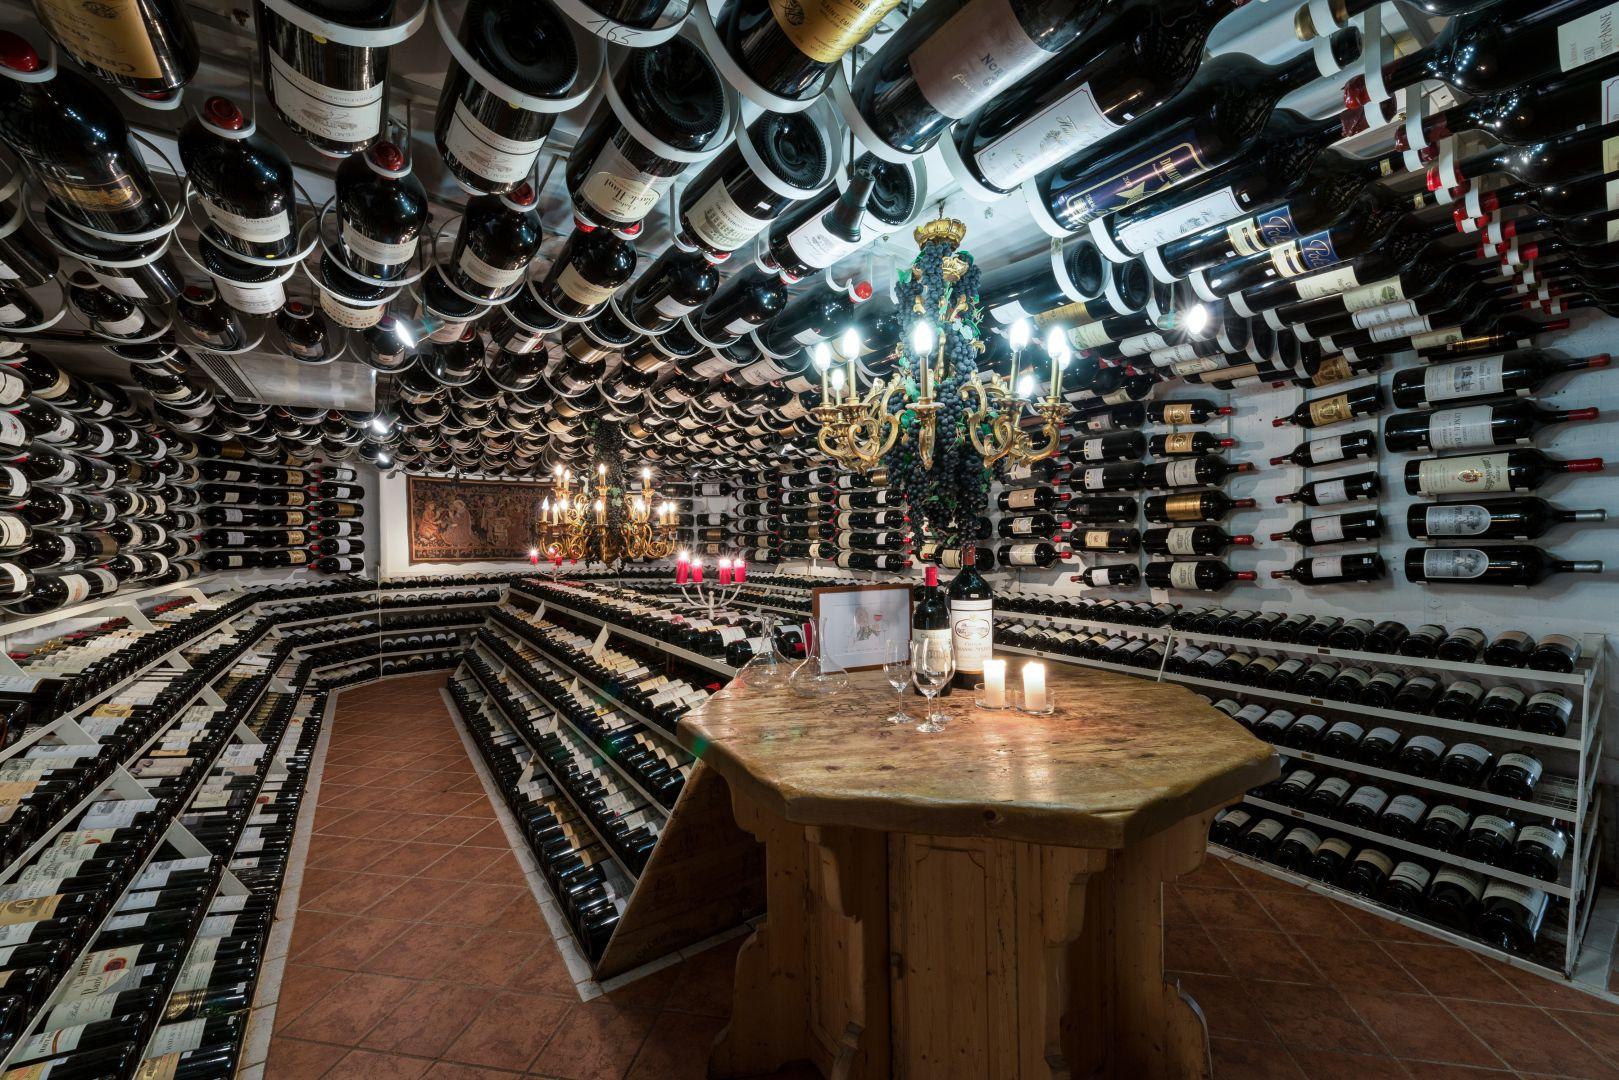 Apres ski st anton The wine cellar at Hospiz Alm